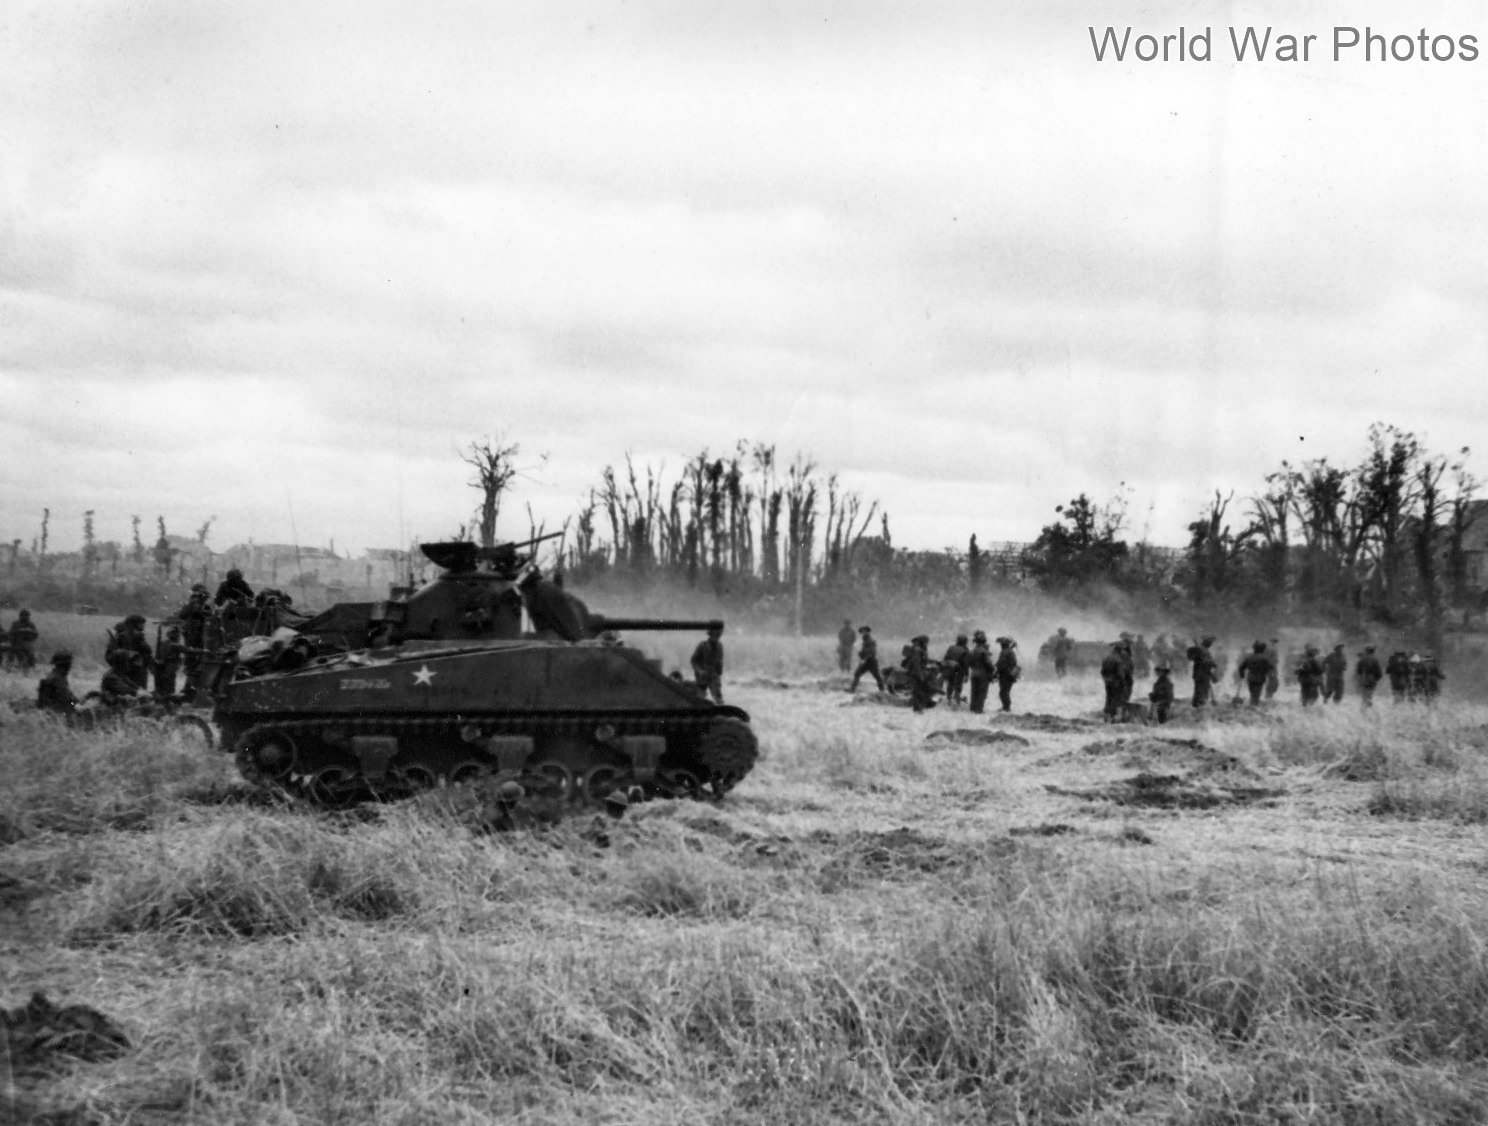 Sherman tank of British Army, Caen Normandy